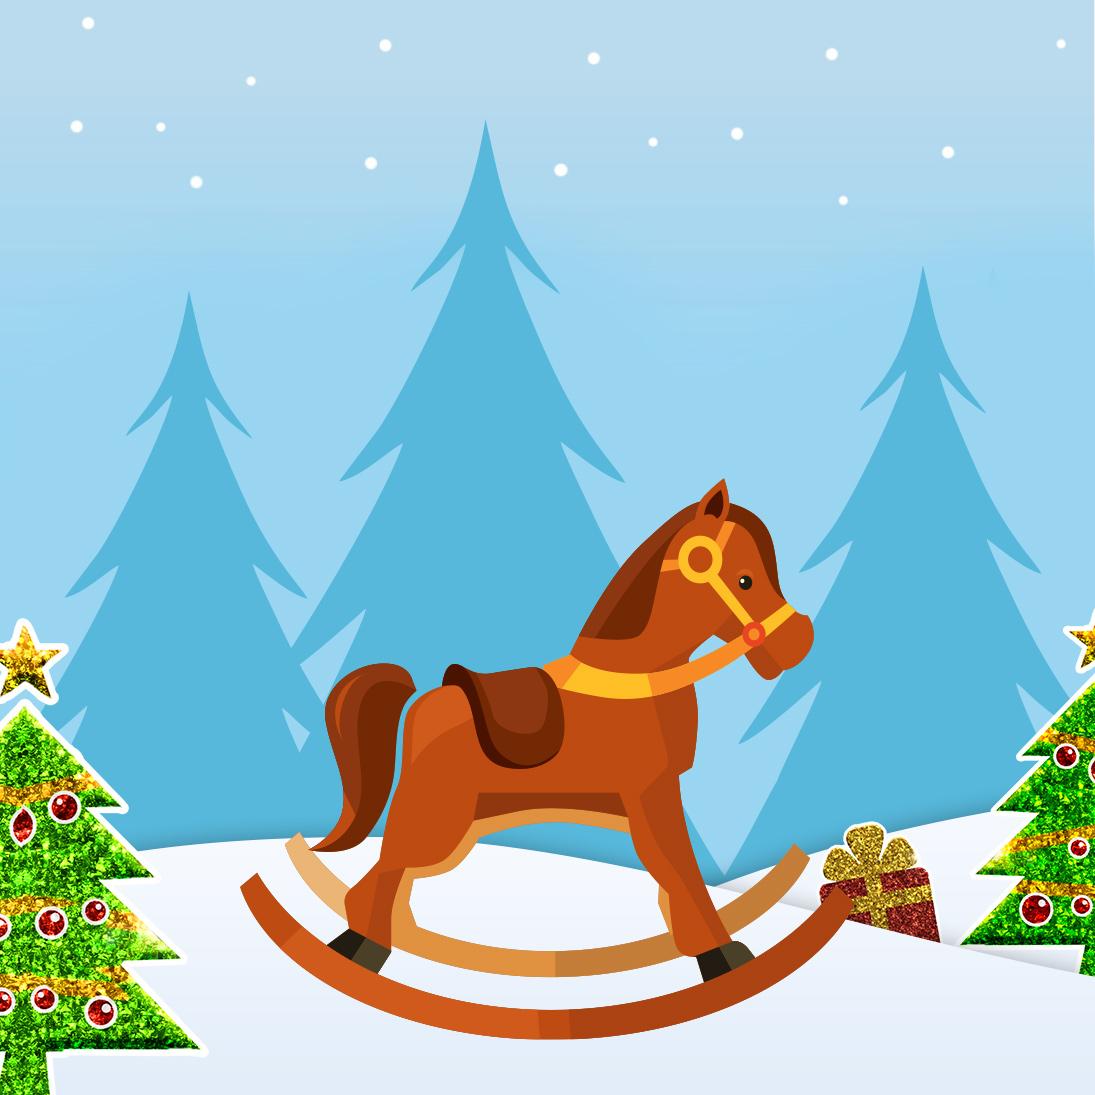 Santa's Rocking Horse